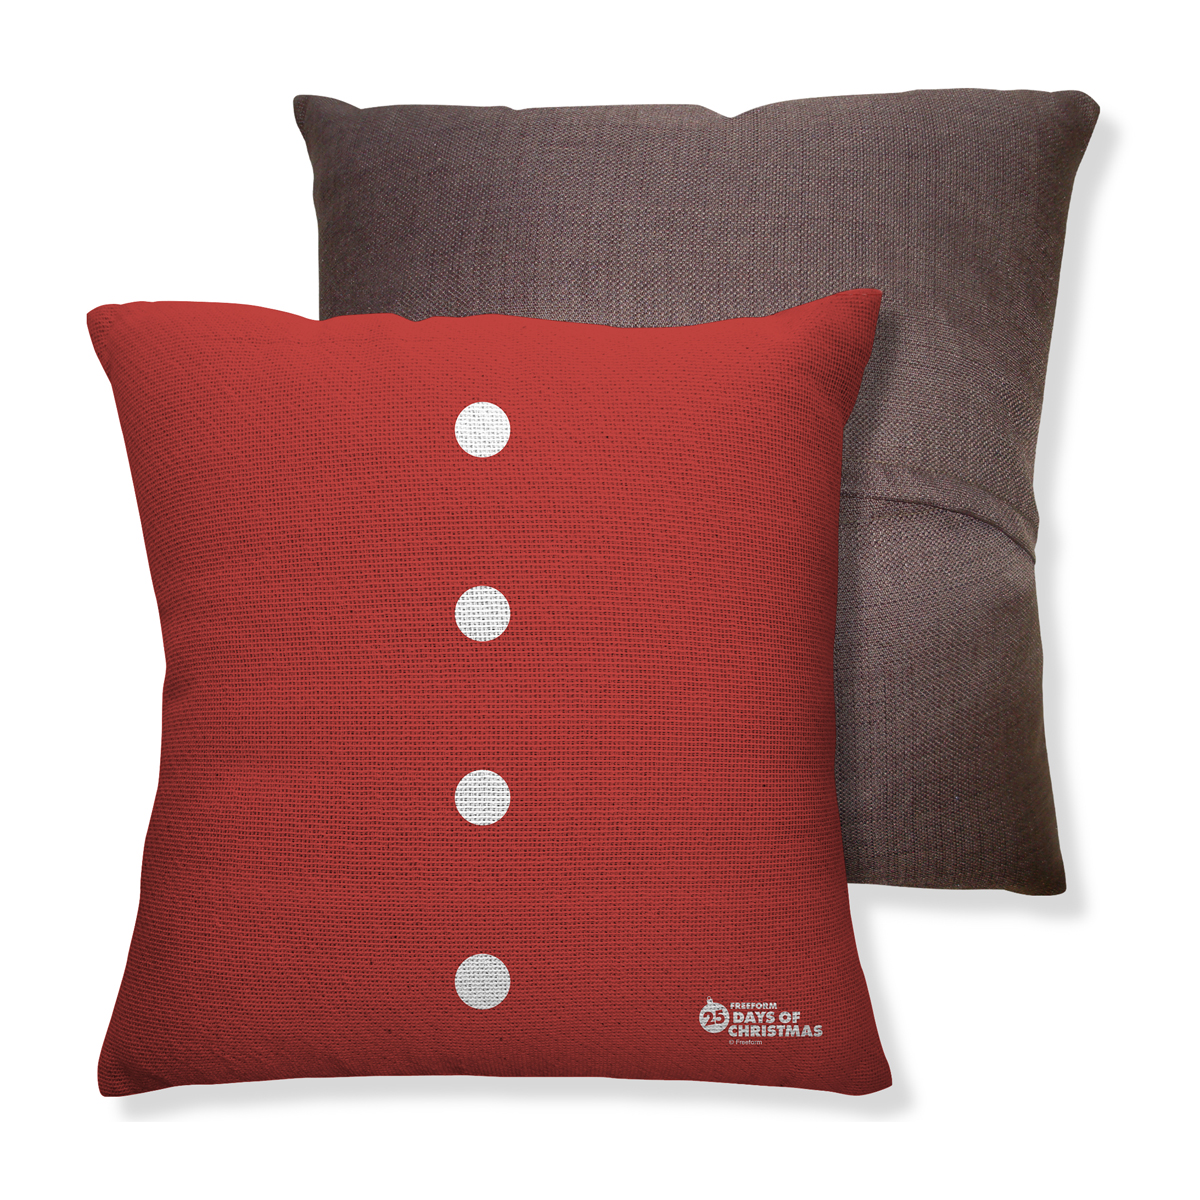 25 Days of Christmas Throw Pillow